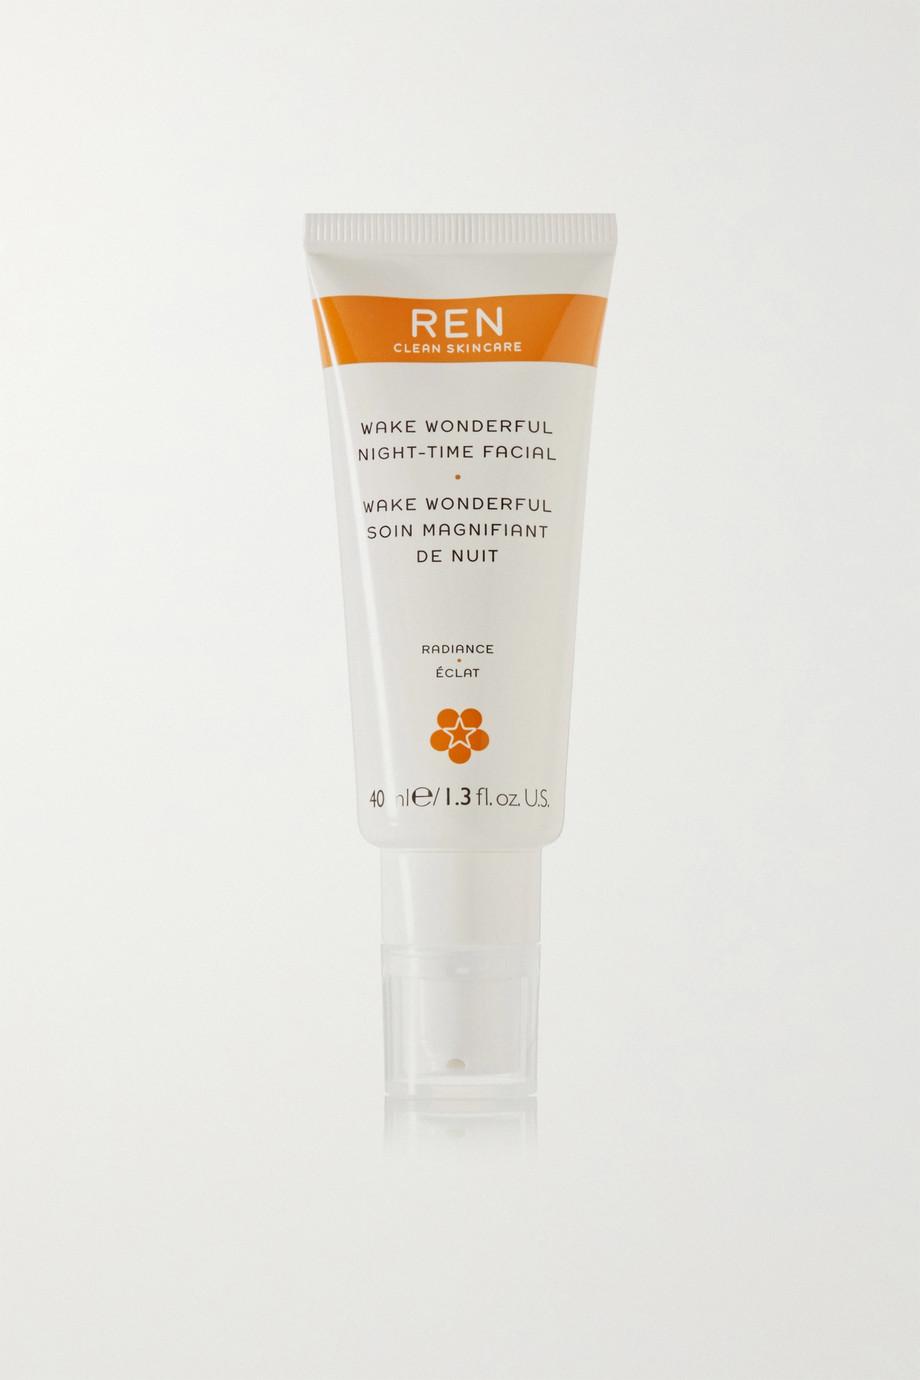 Wake Wonderful Night-Time Facial, 40ml, by Ren Skincare